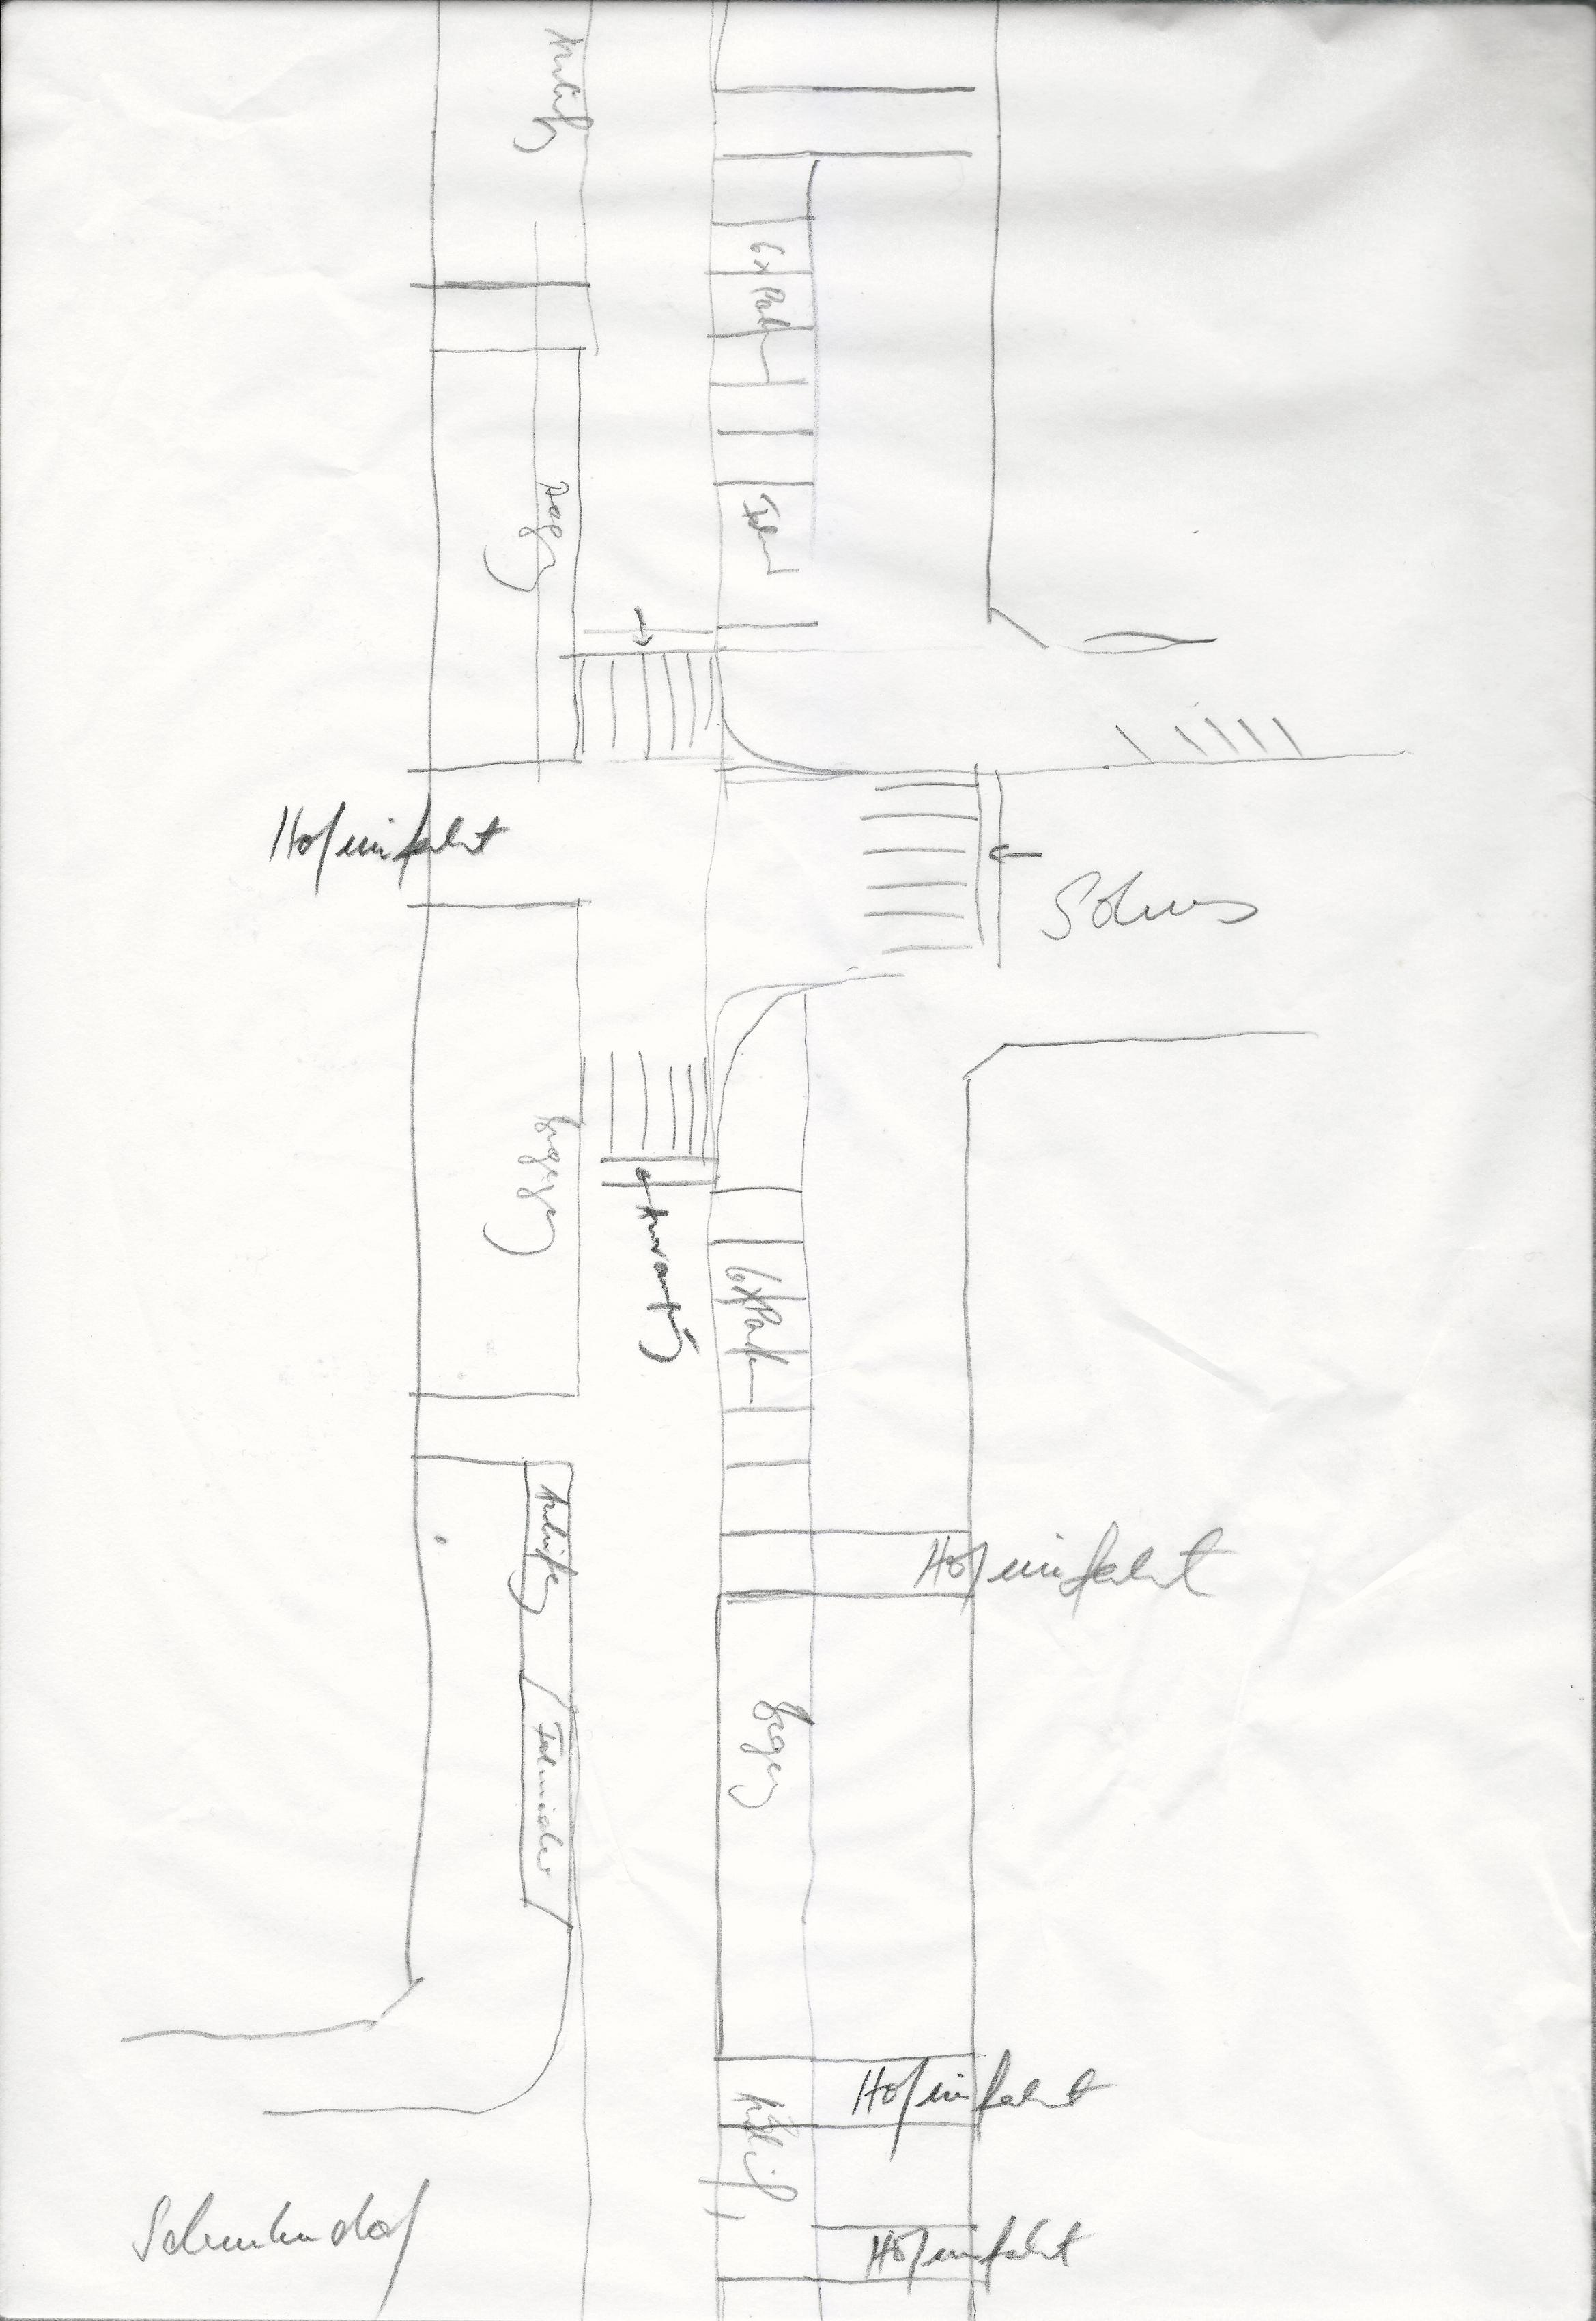 BegegnungBergmann 16234 - ARARAT Skizze 5.v6